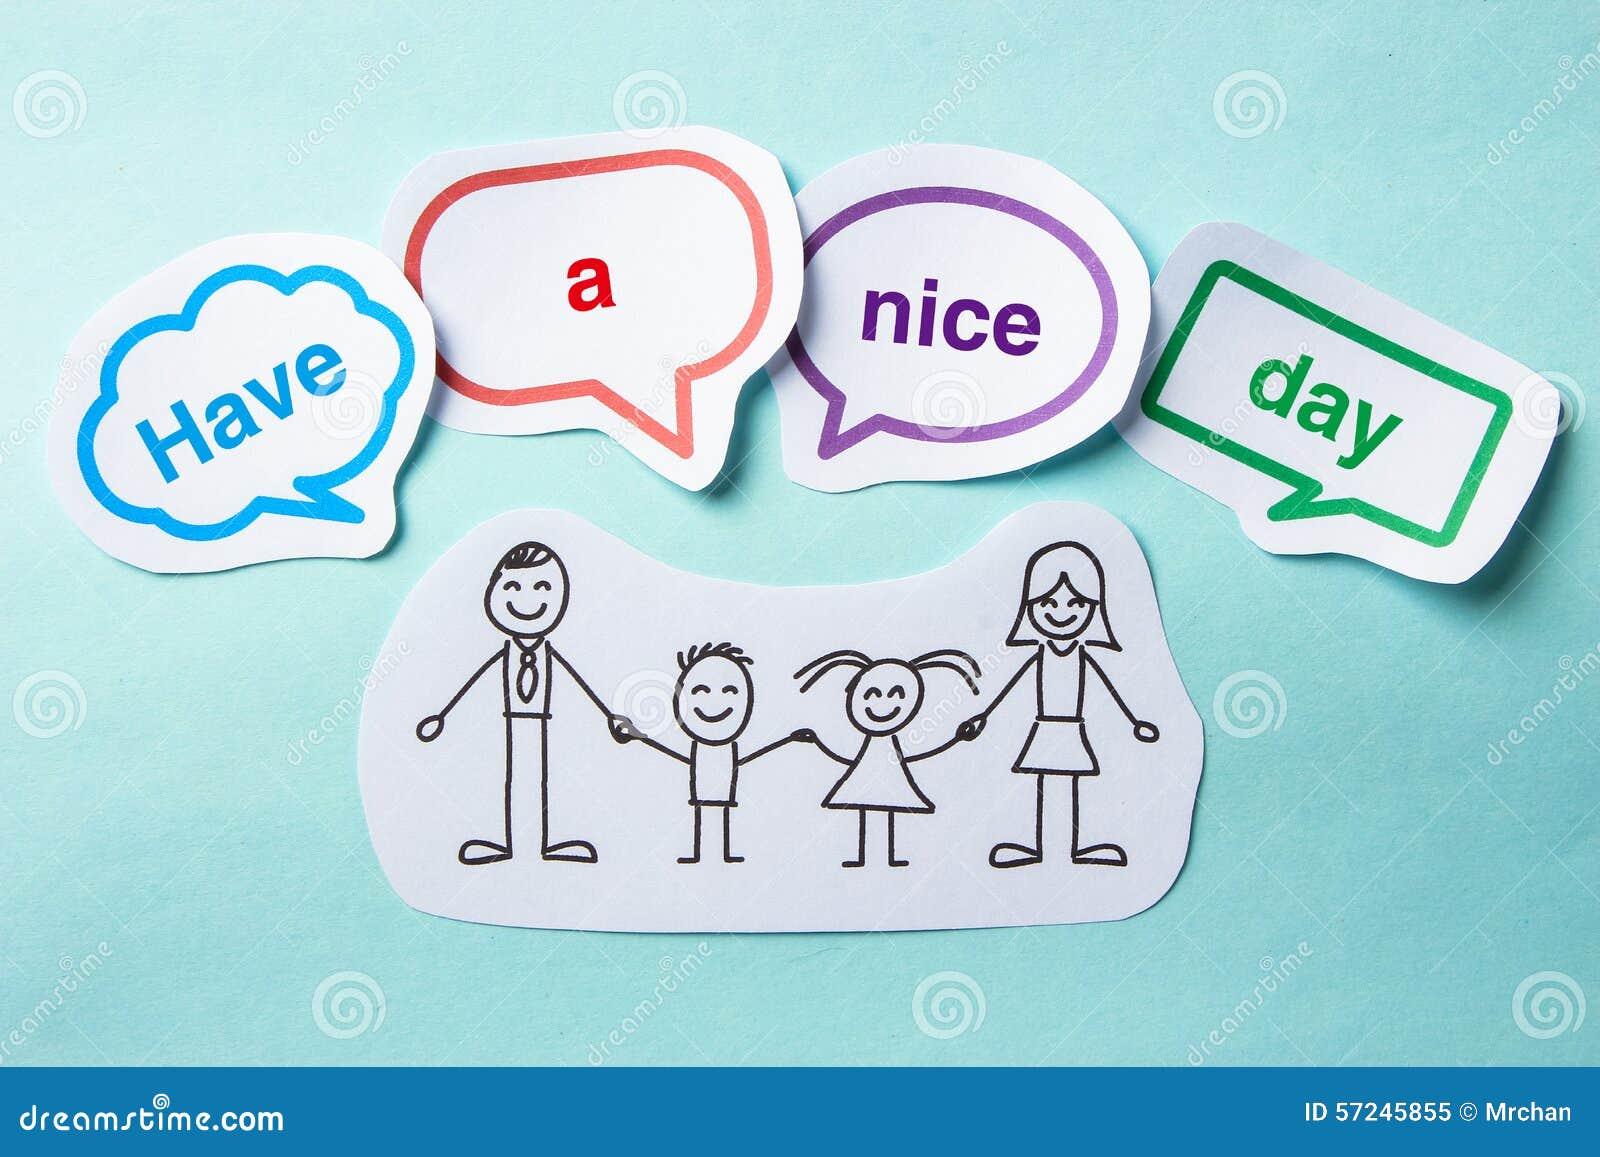 Family day speech